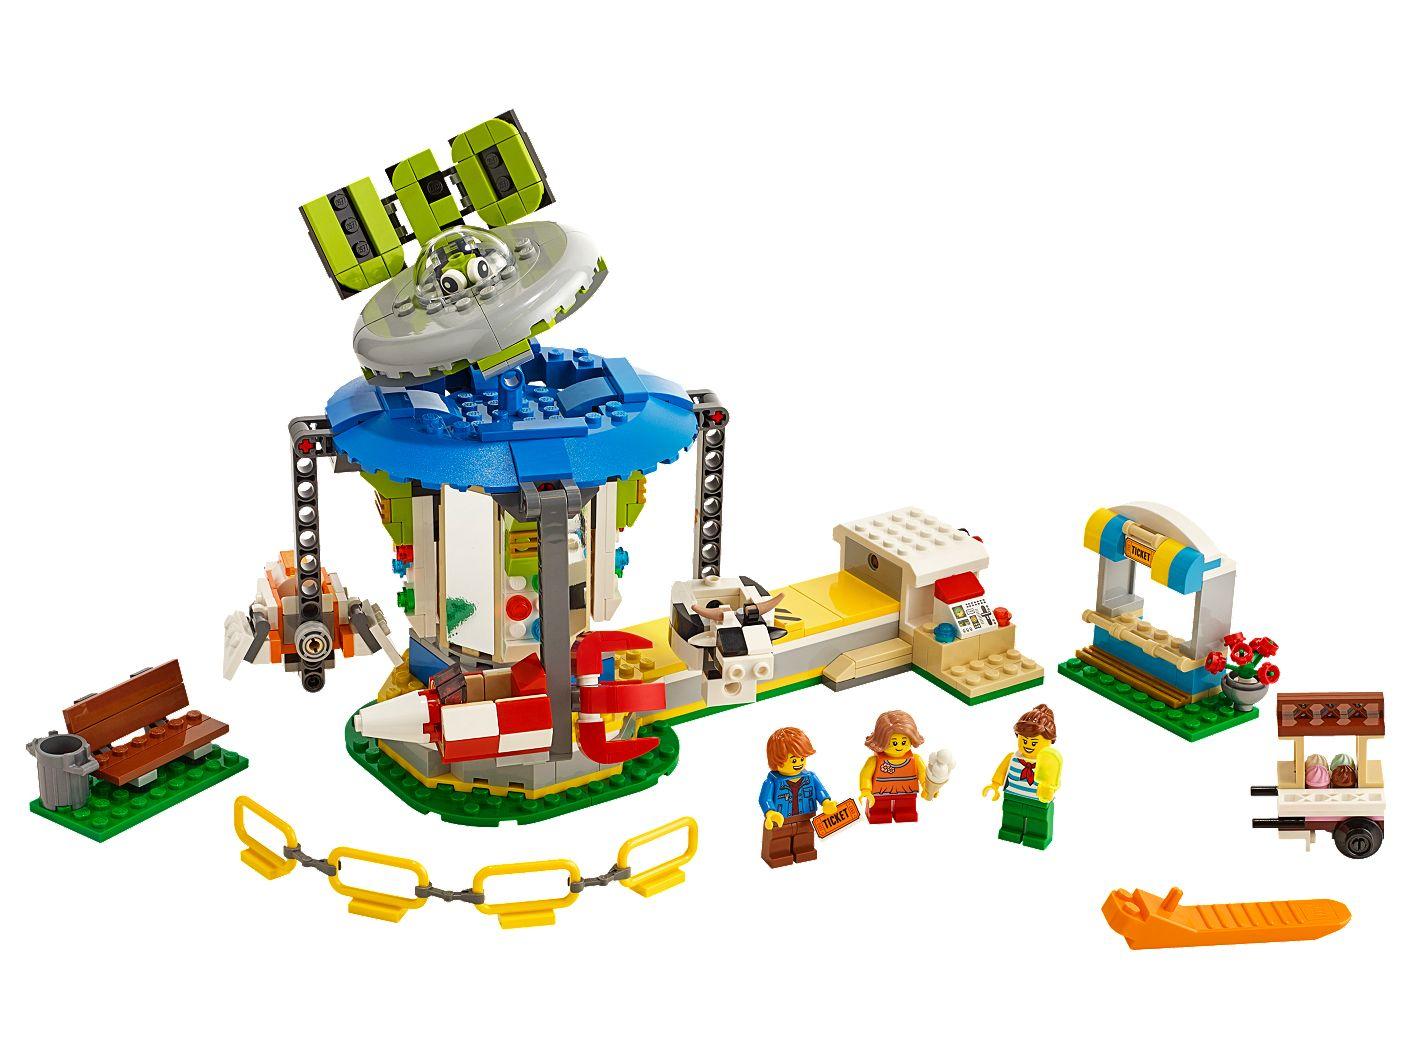 LEGO Creator Fairground Carousel 31095 £31.49 + £3.95 delivery @ LEGO Shop (instore & online)